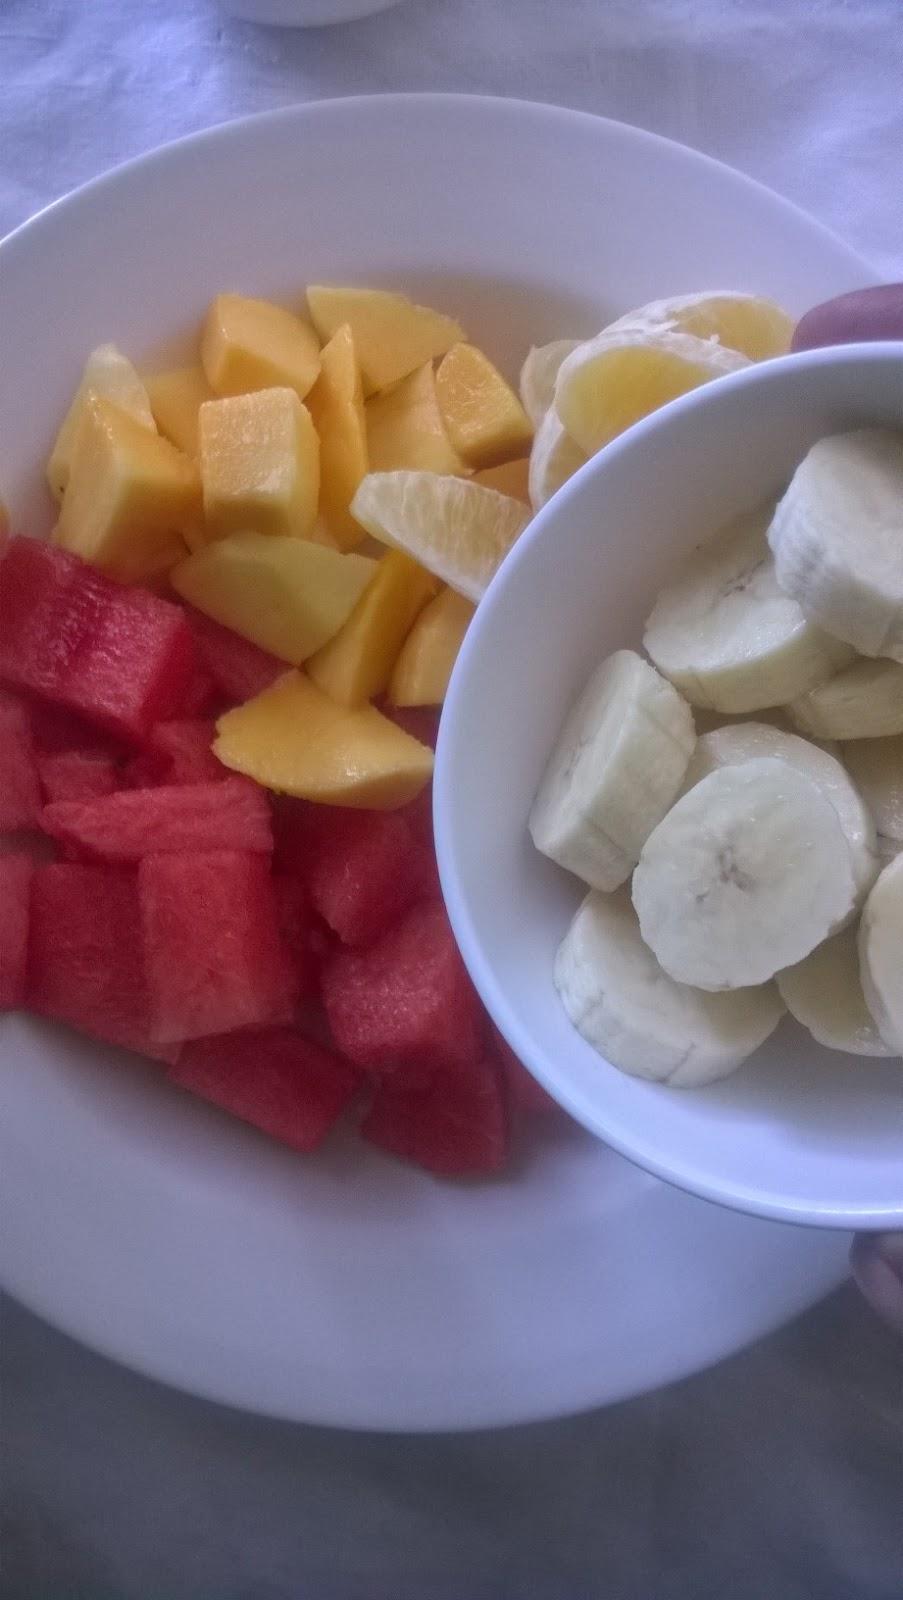 ORANGE BANANA WATERMELON FRUIT SALAD